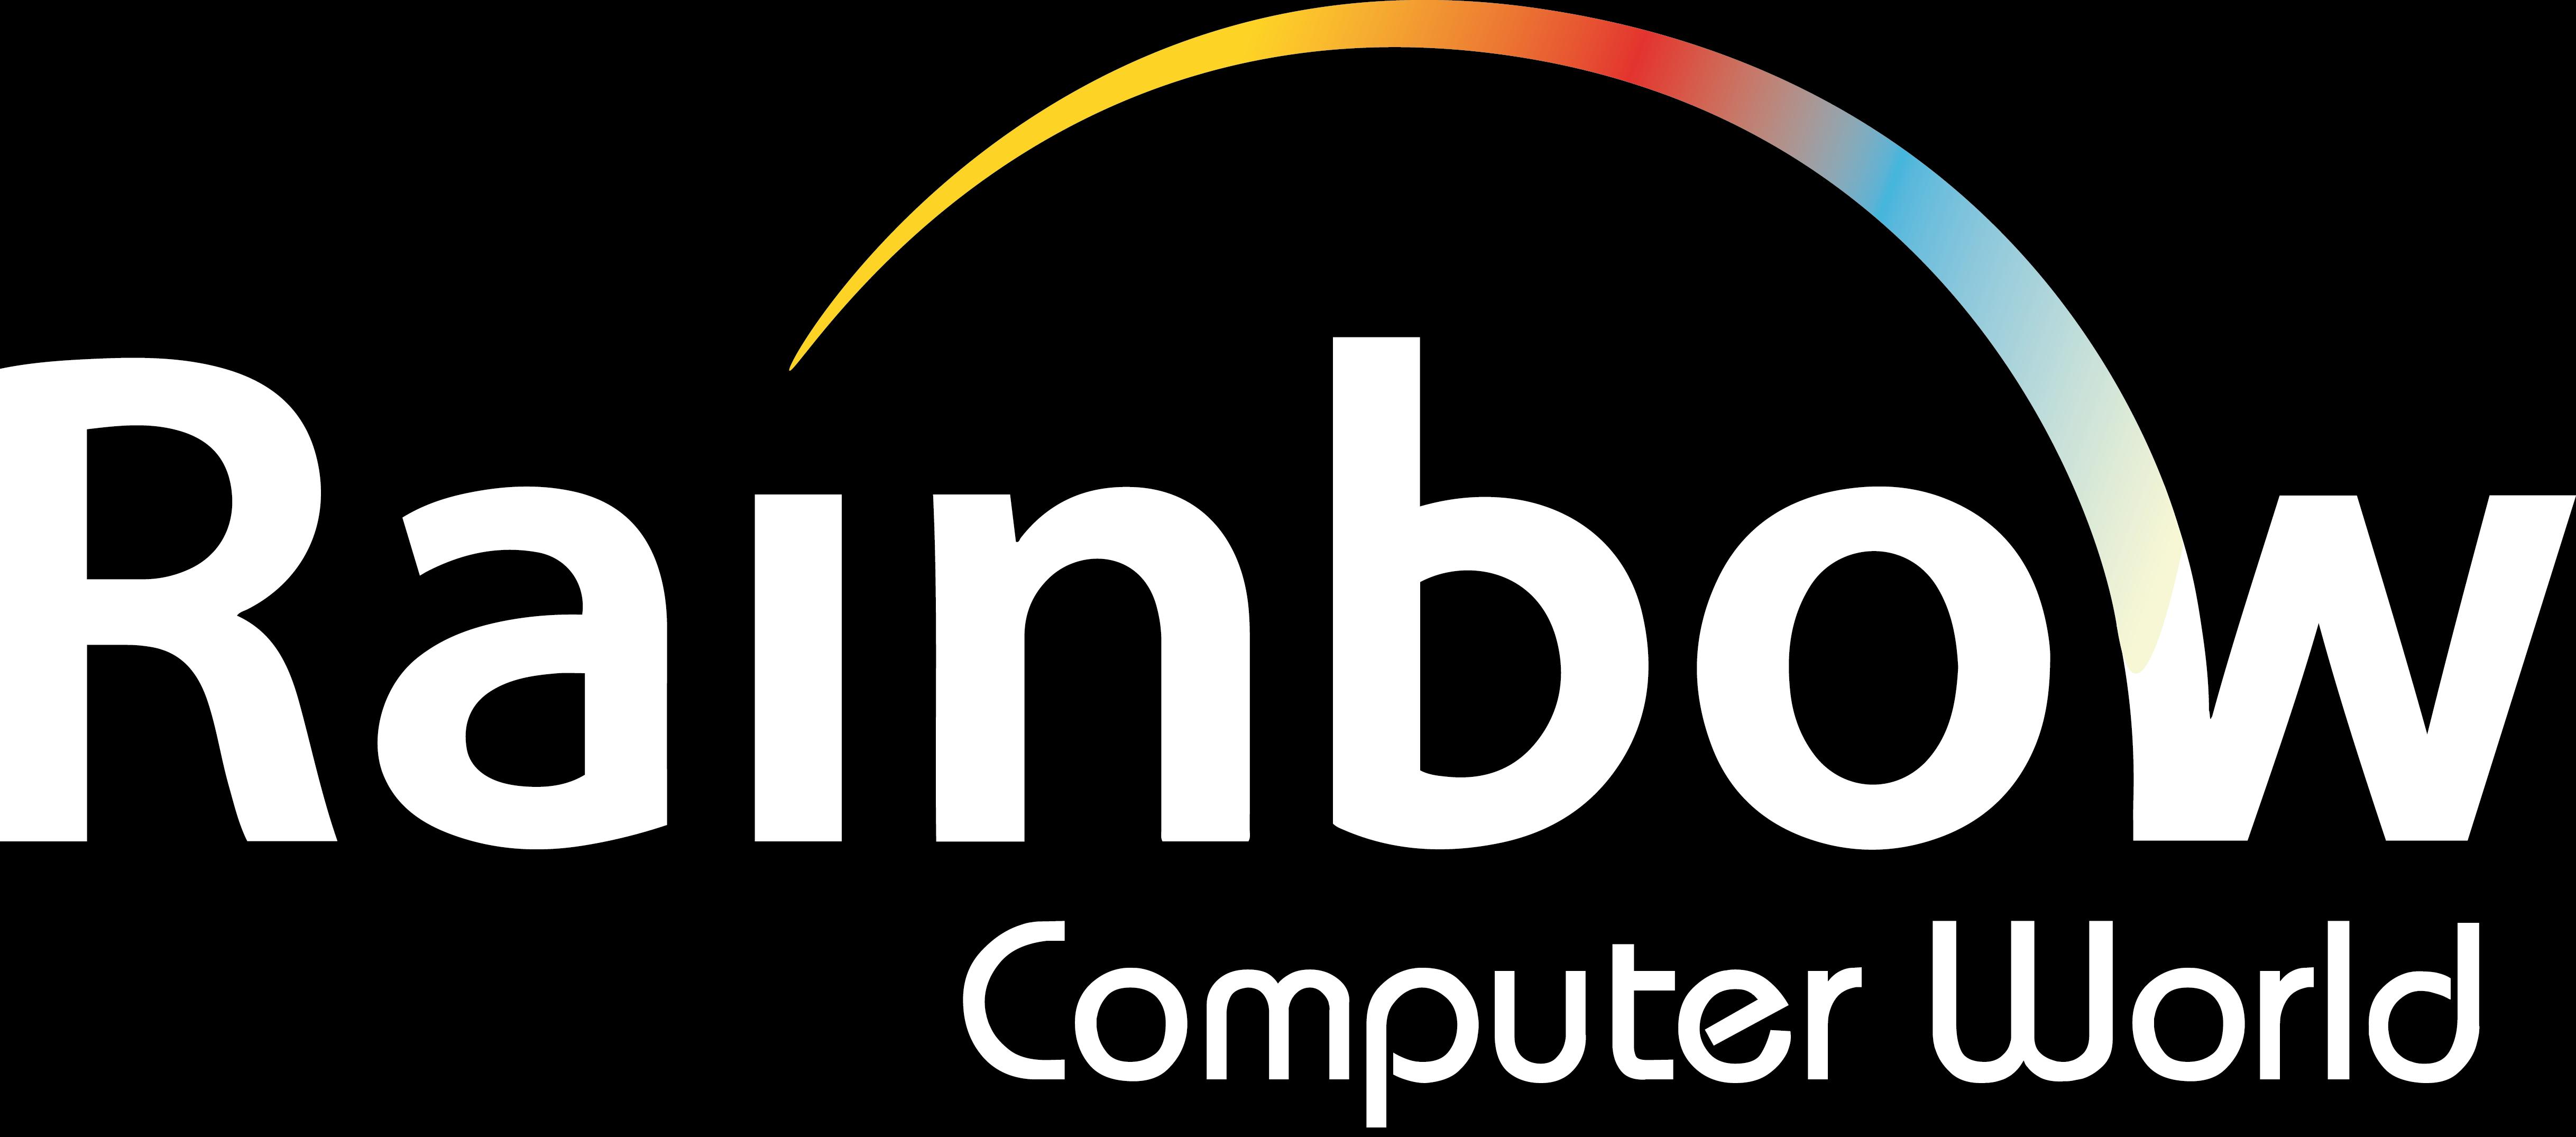 rainbow caomputer world